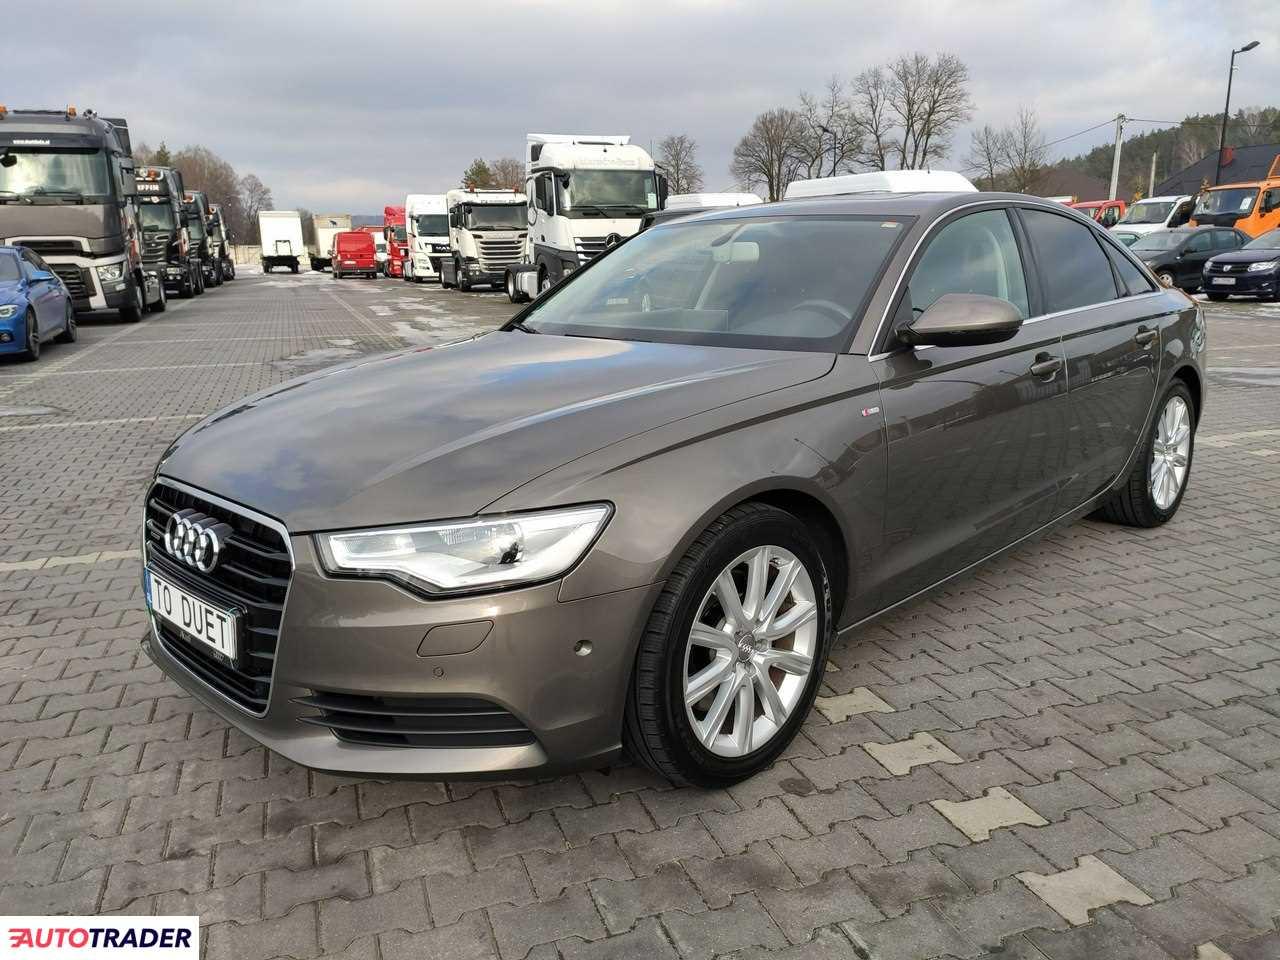 Audi A6 2011 3.0 245 KM